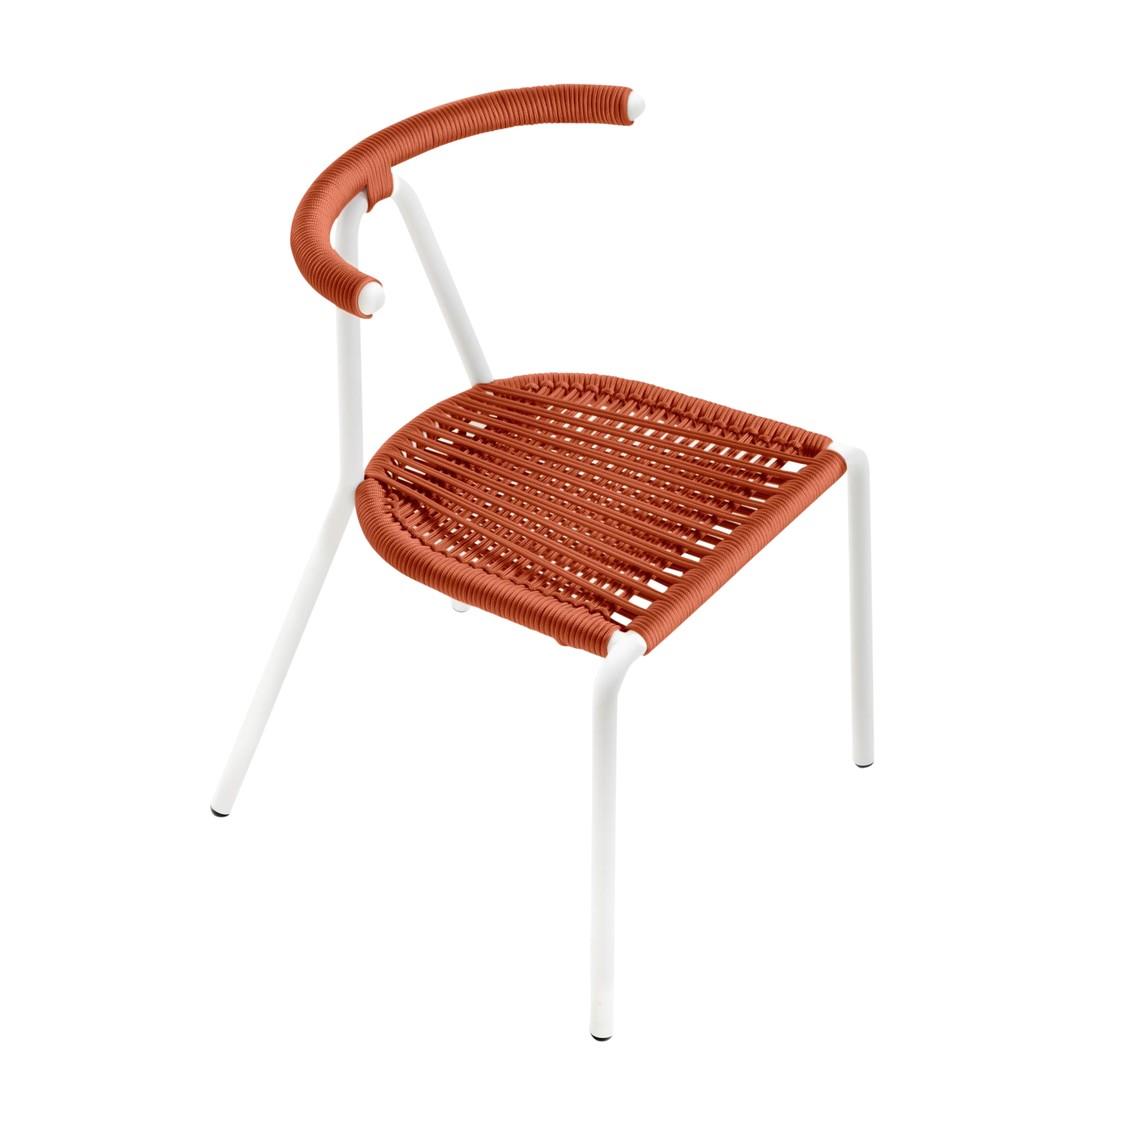 Toro Chair Seat Braided Cords